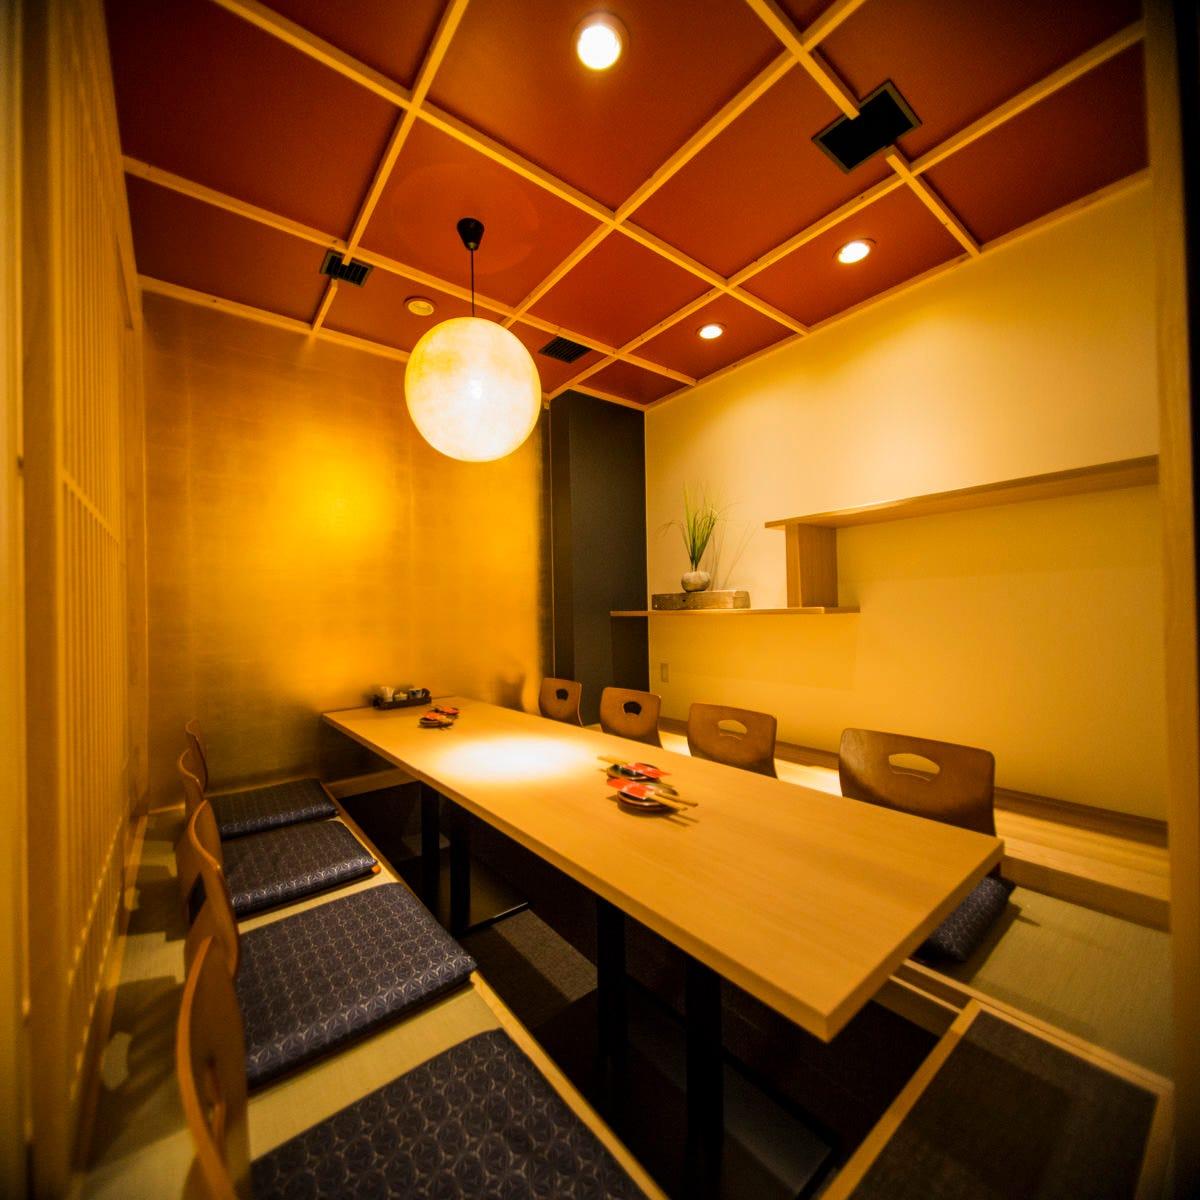 【個室空間】接待・会社宴会にも 個室は2名様~最大40名様対応